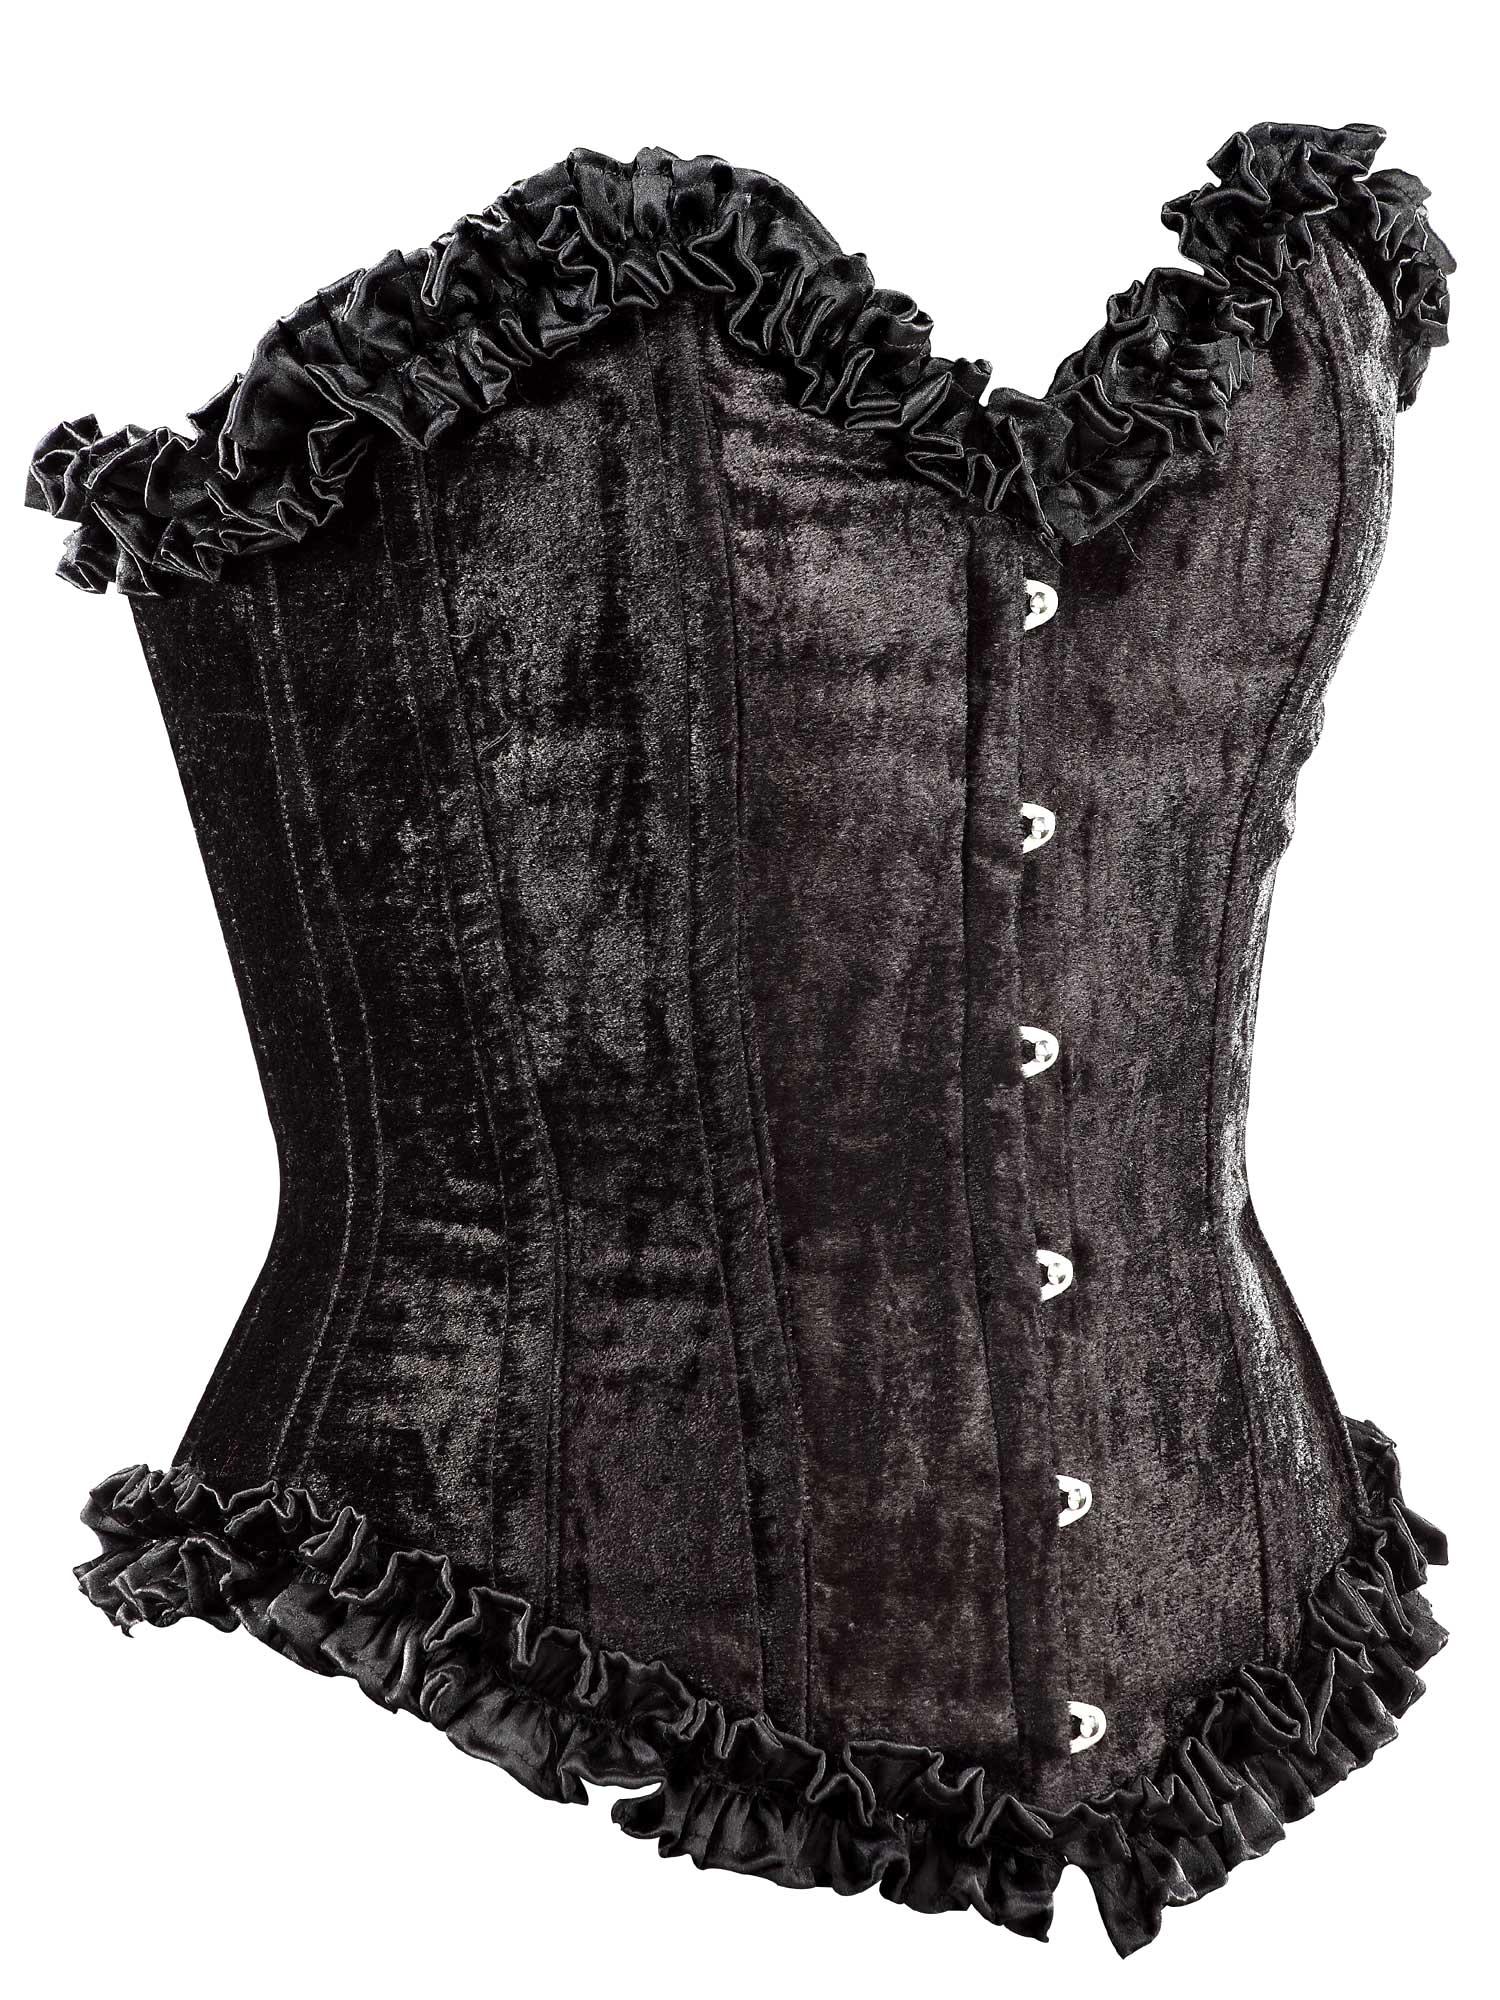 black_velvet_fabric_steel_boning_overbust_corset_waist_cincher_bustier_bustiers_and_corsets_4.jpg